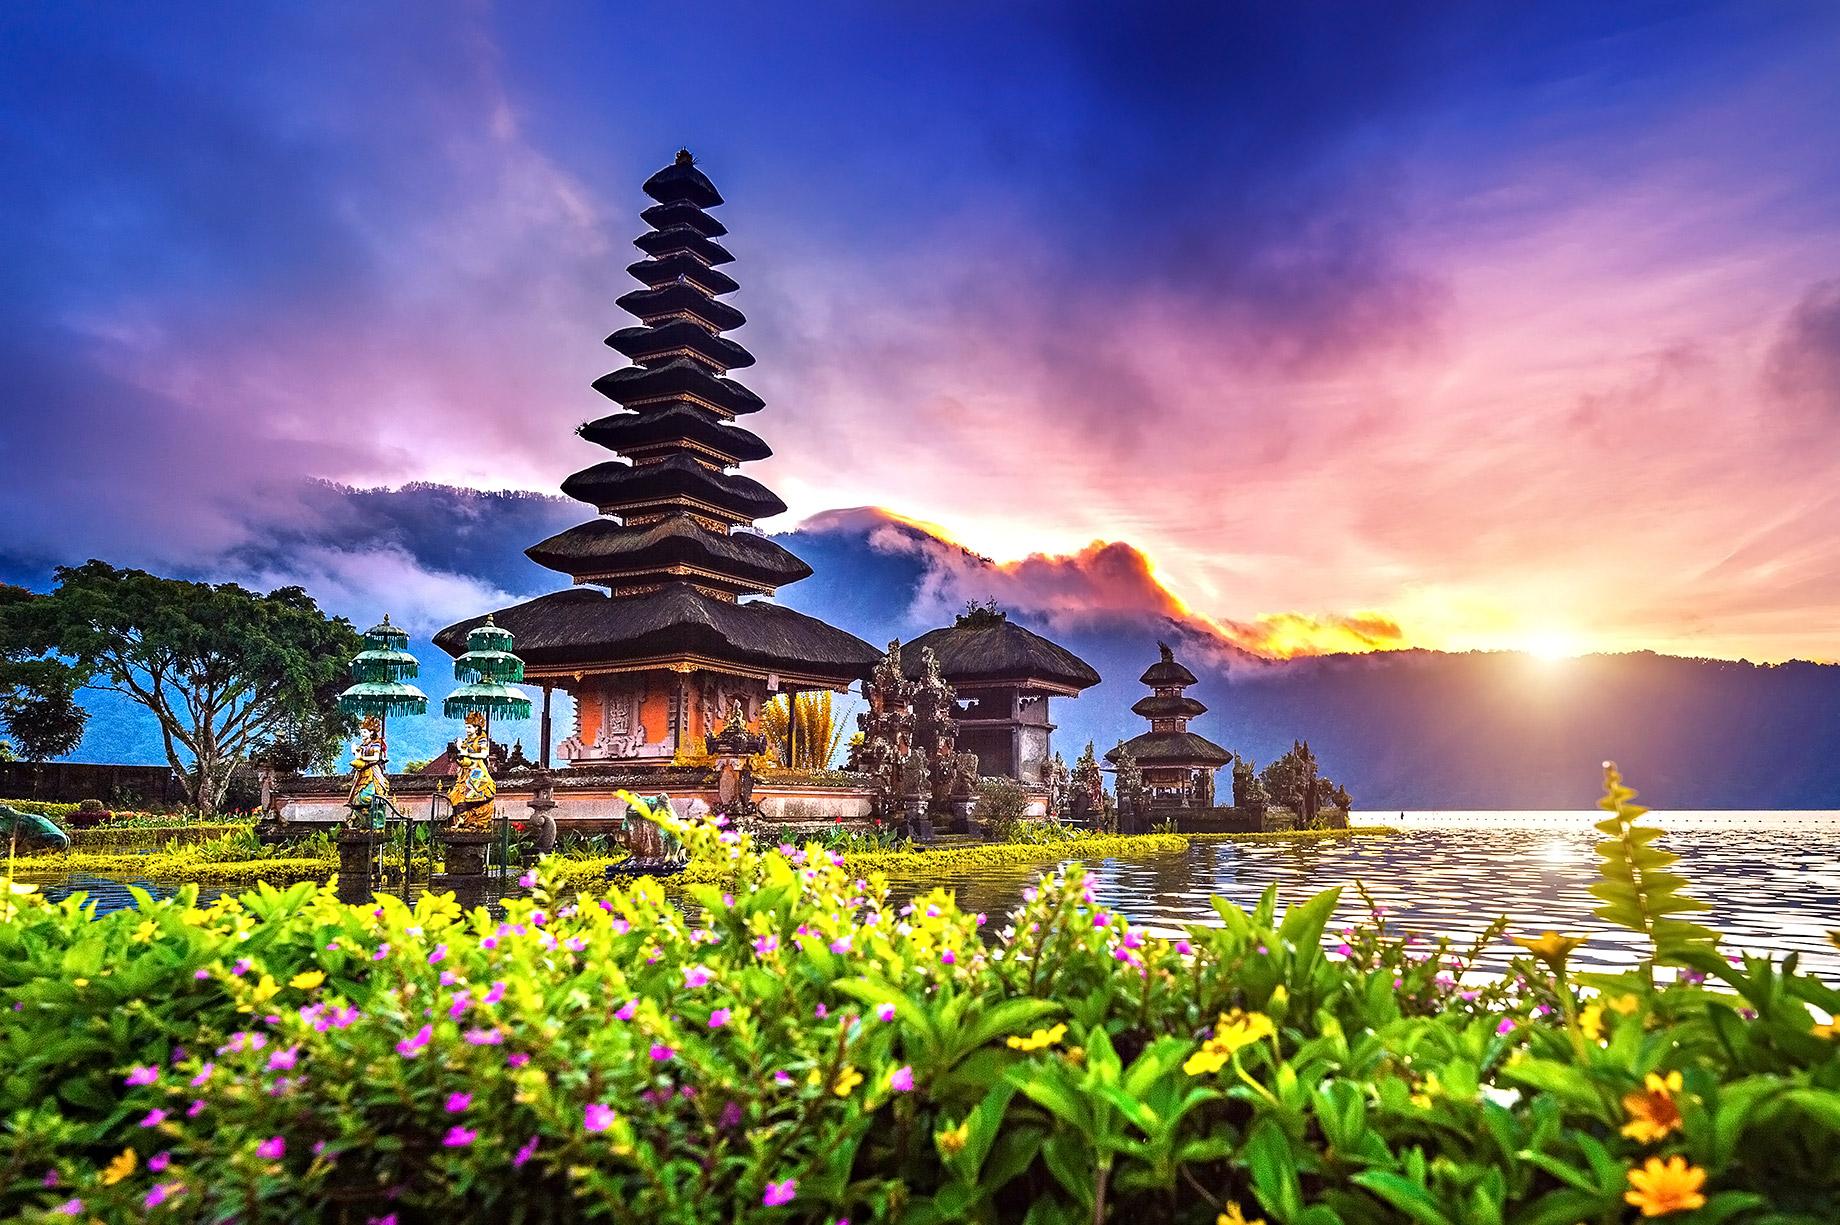 Temple Pura Ulun Danu Bratan - Bali, Indonésie - Top 10 des destinations de voyage de luxe dans le monde